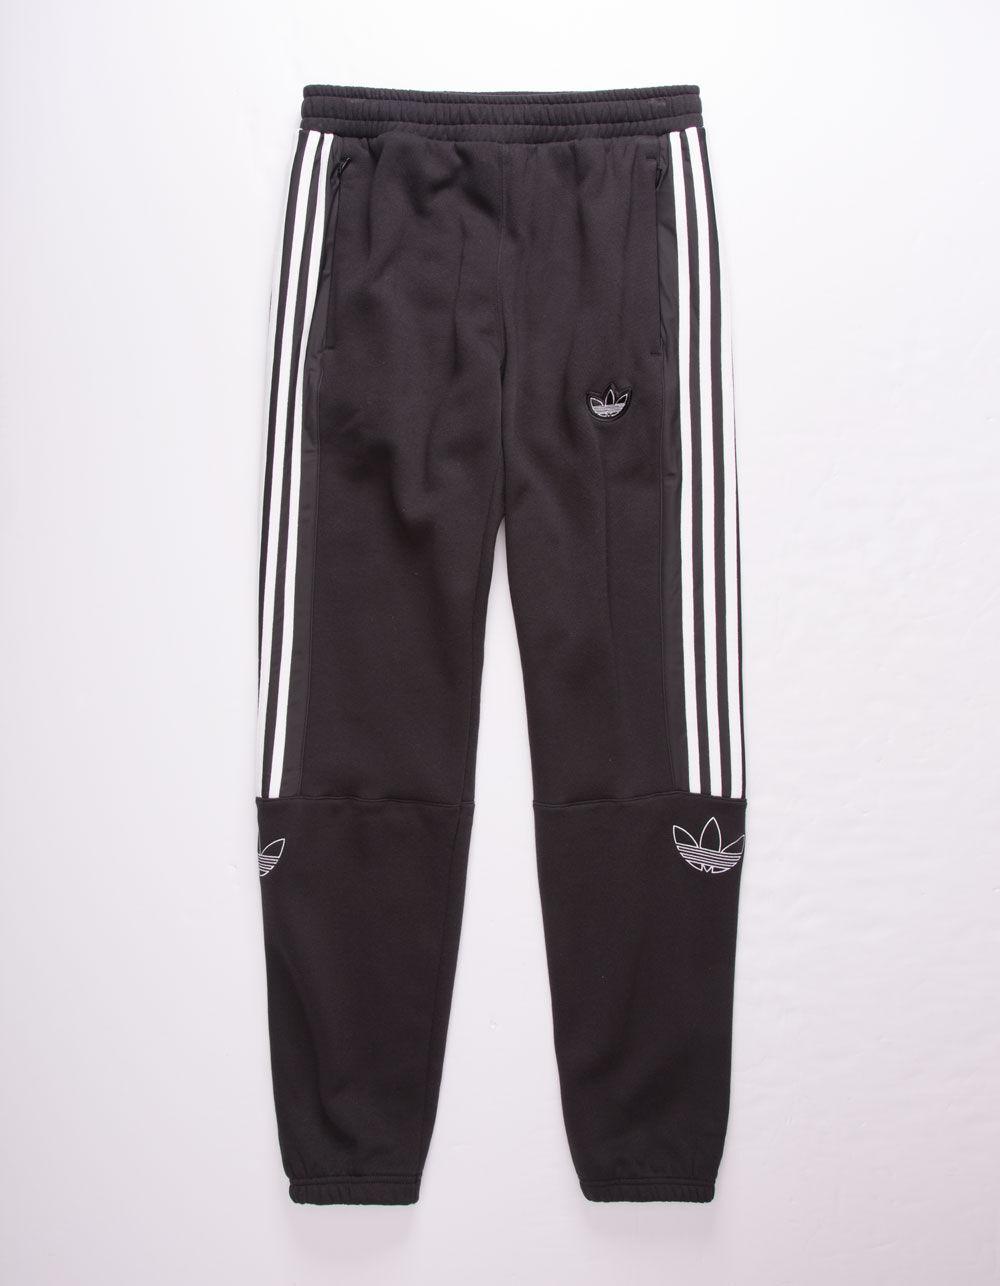 ADIDAS Outline Black Sweatpants